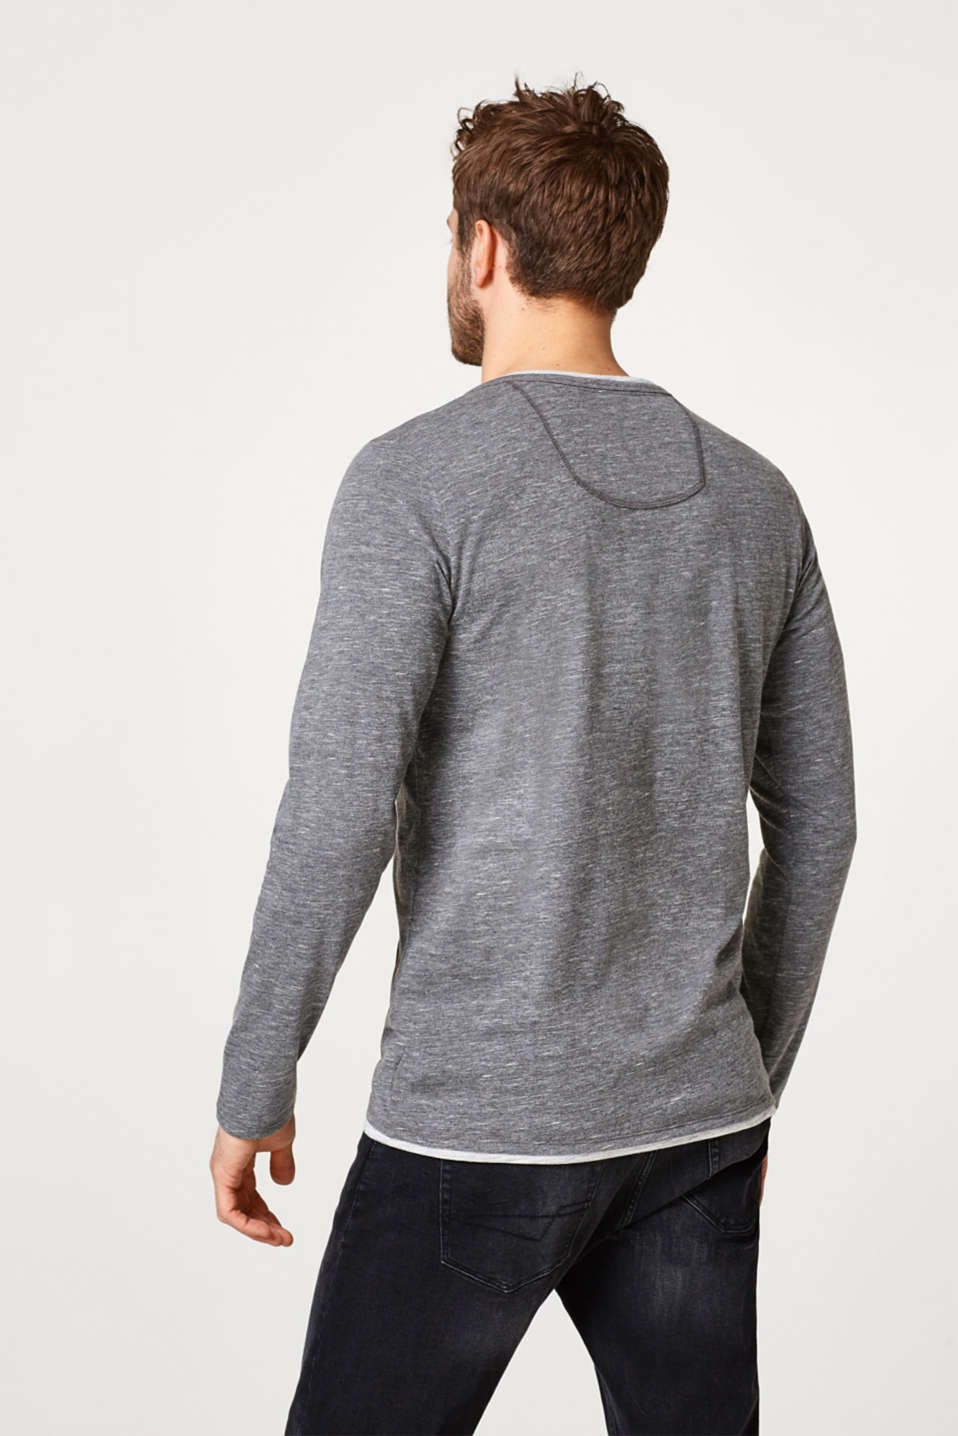 Jersey long sleeve top + a Henley neckline, DARK GREY, detail image number 3